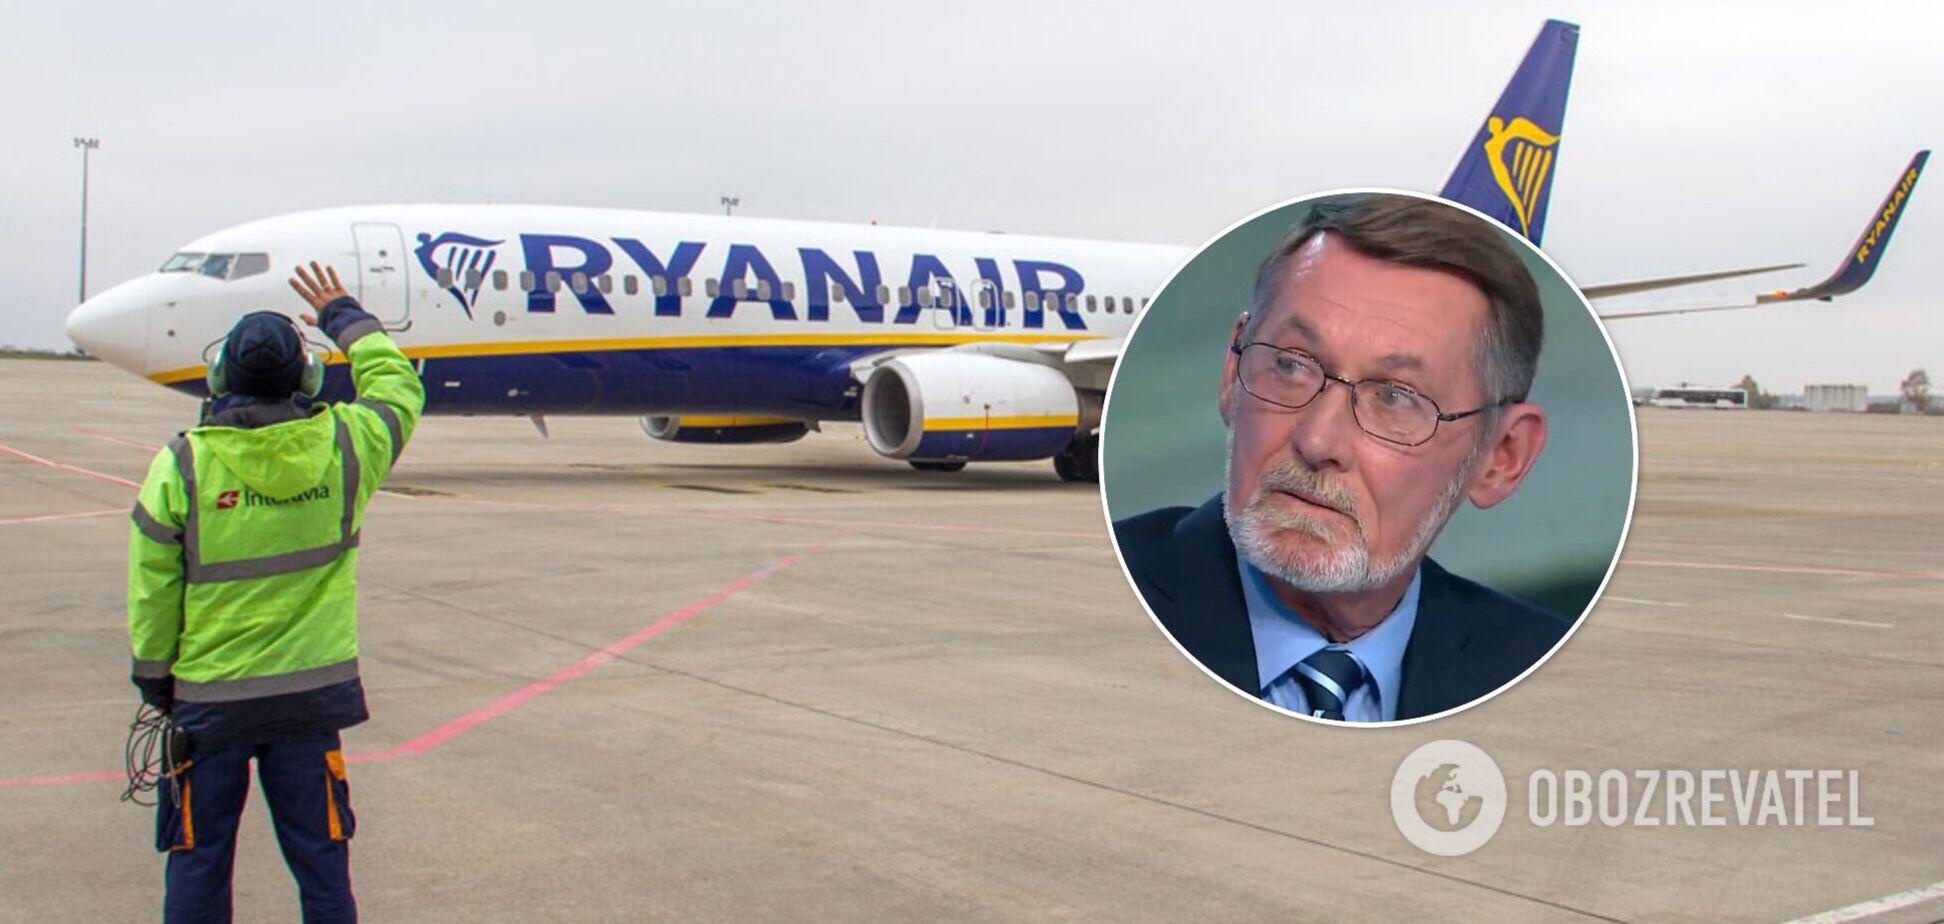 Александр Лиходед оценил инцидент с Ryanair